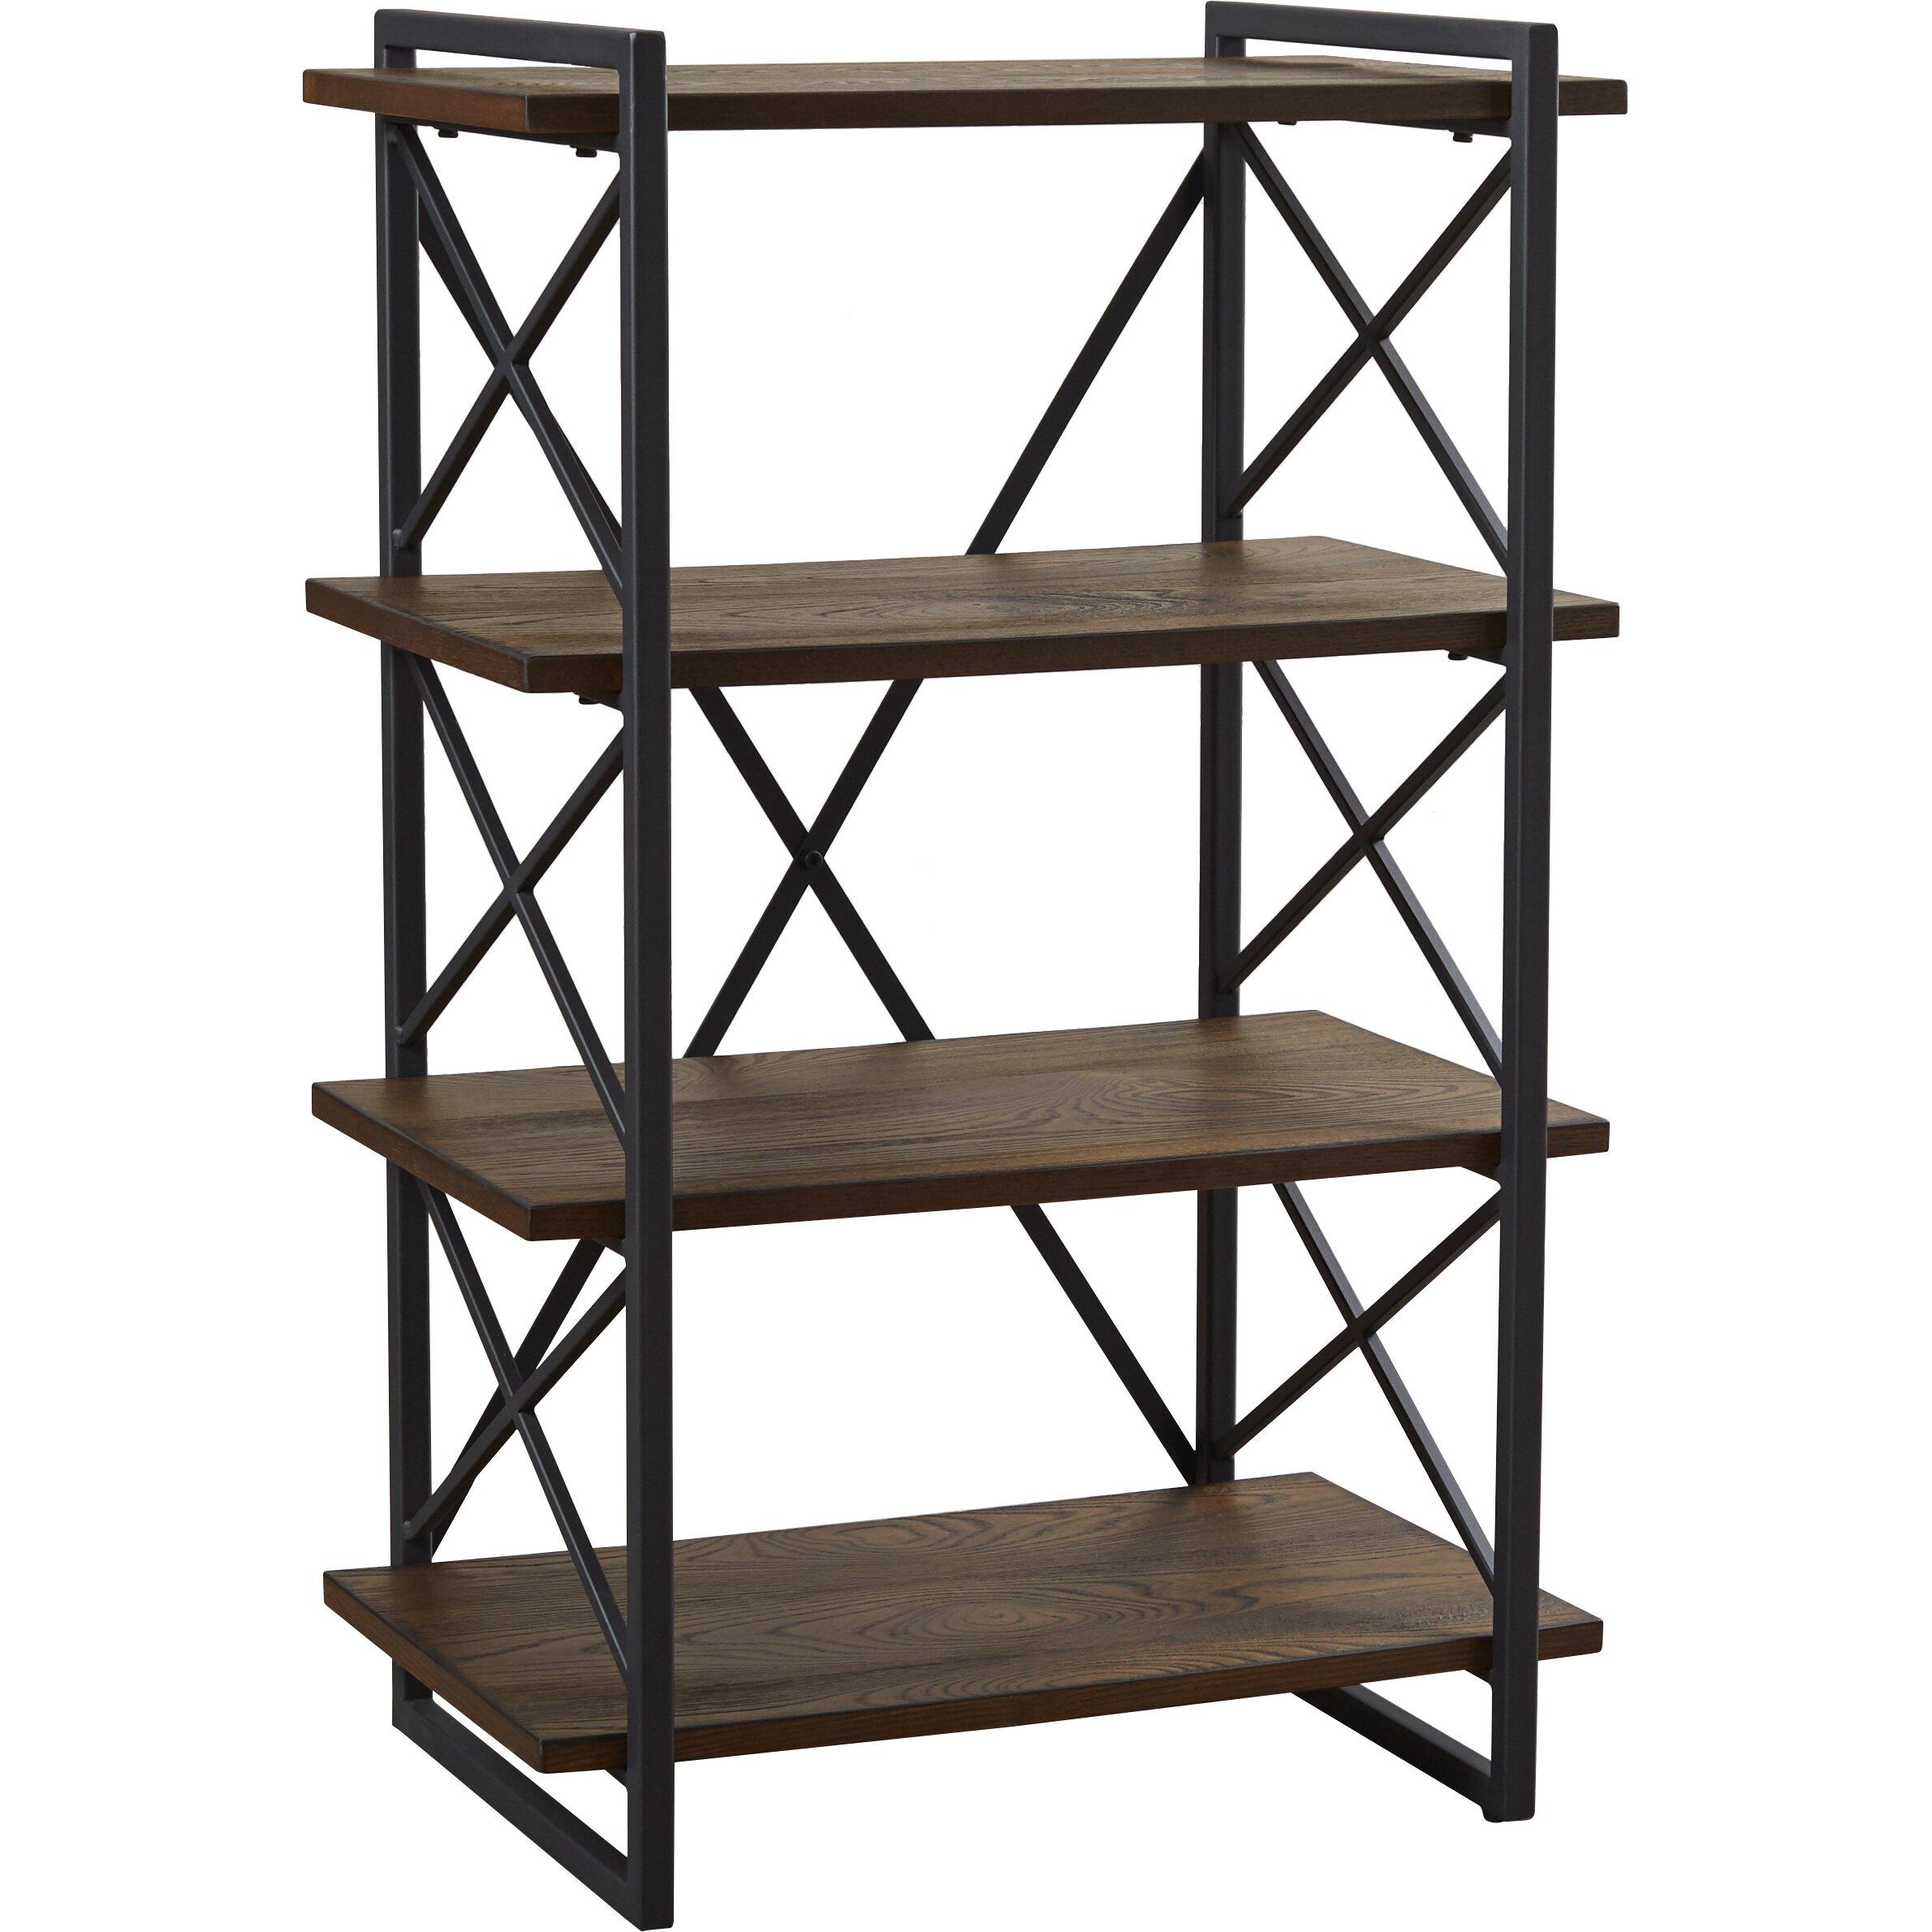 trent austin design coalinga 38 etagere bookcase. Black Bedroom Furniture Sets. Home Design Ideas